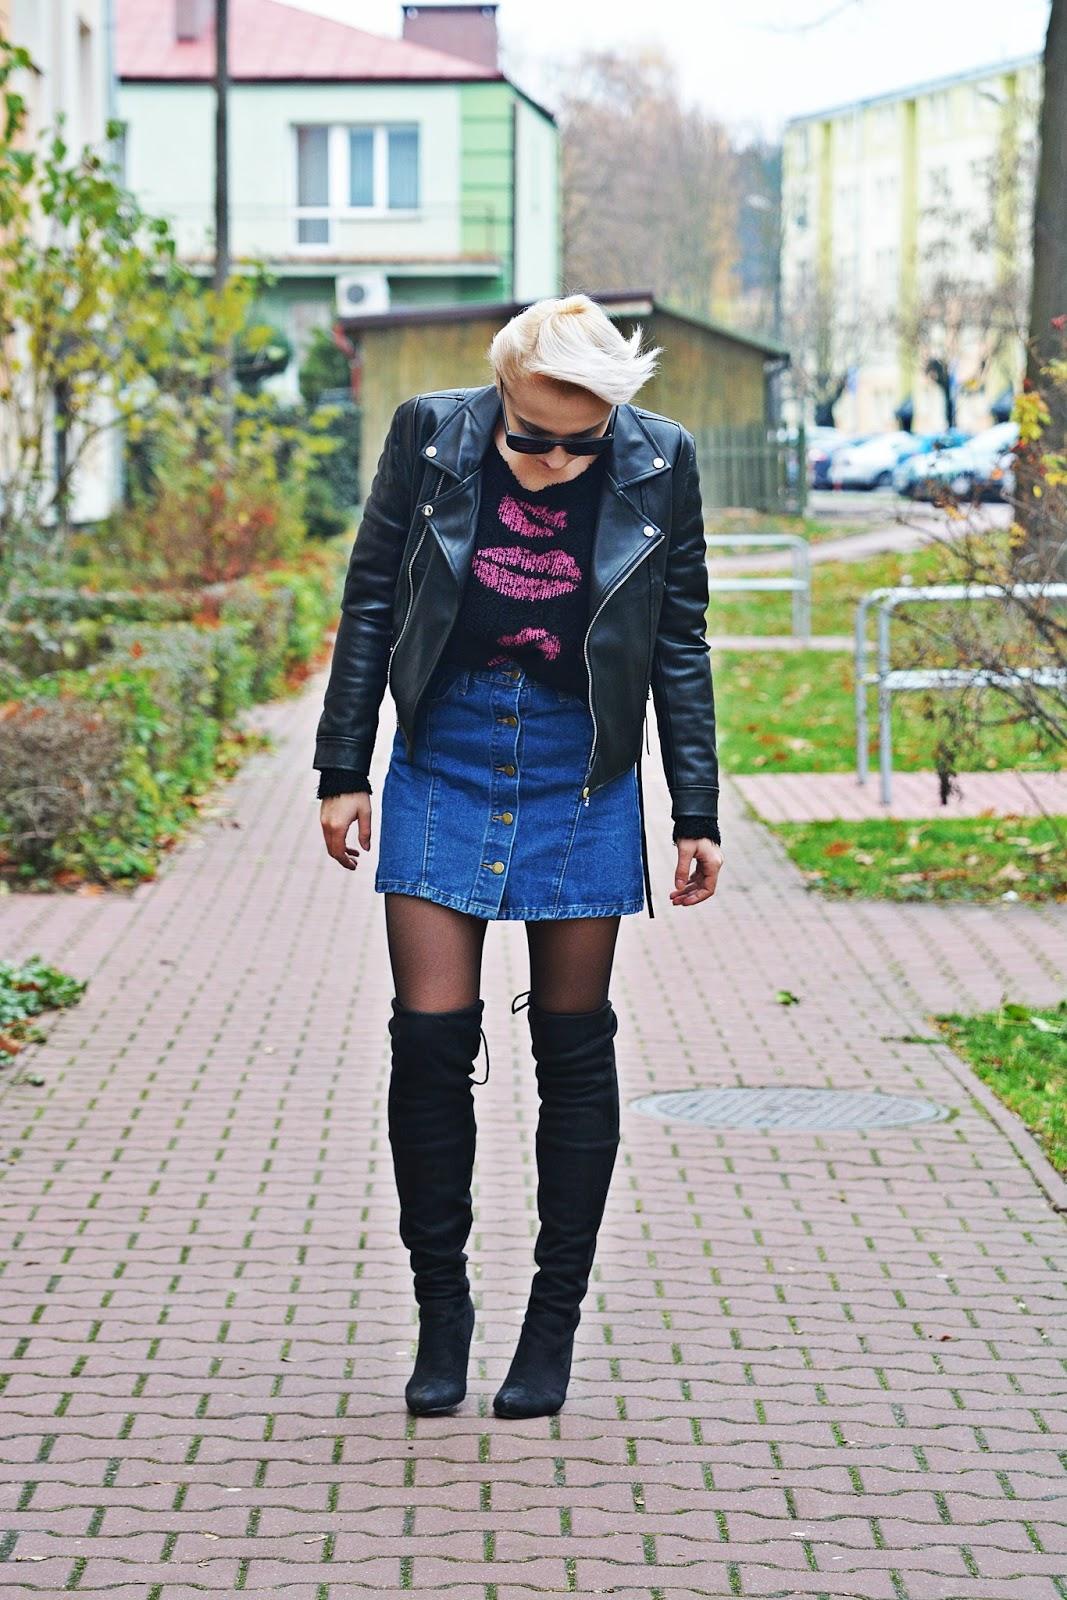 jeansowa_spodnica_skorzana_ramoneska_buty_za_kolano_karyn2